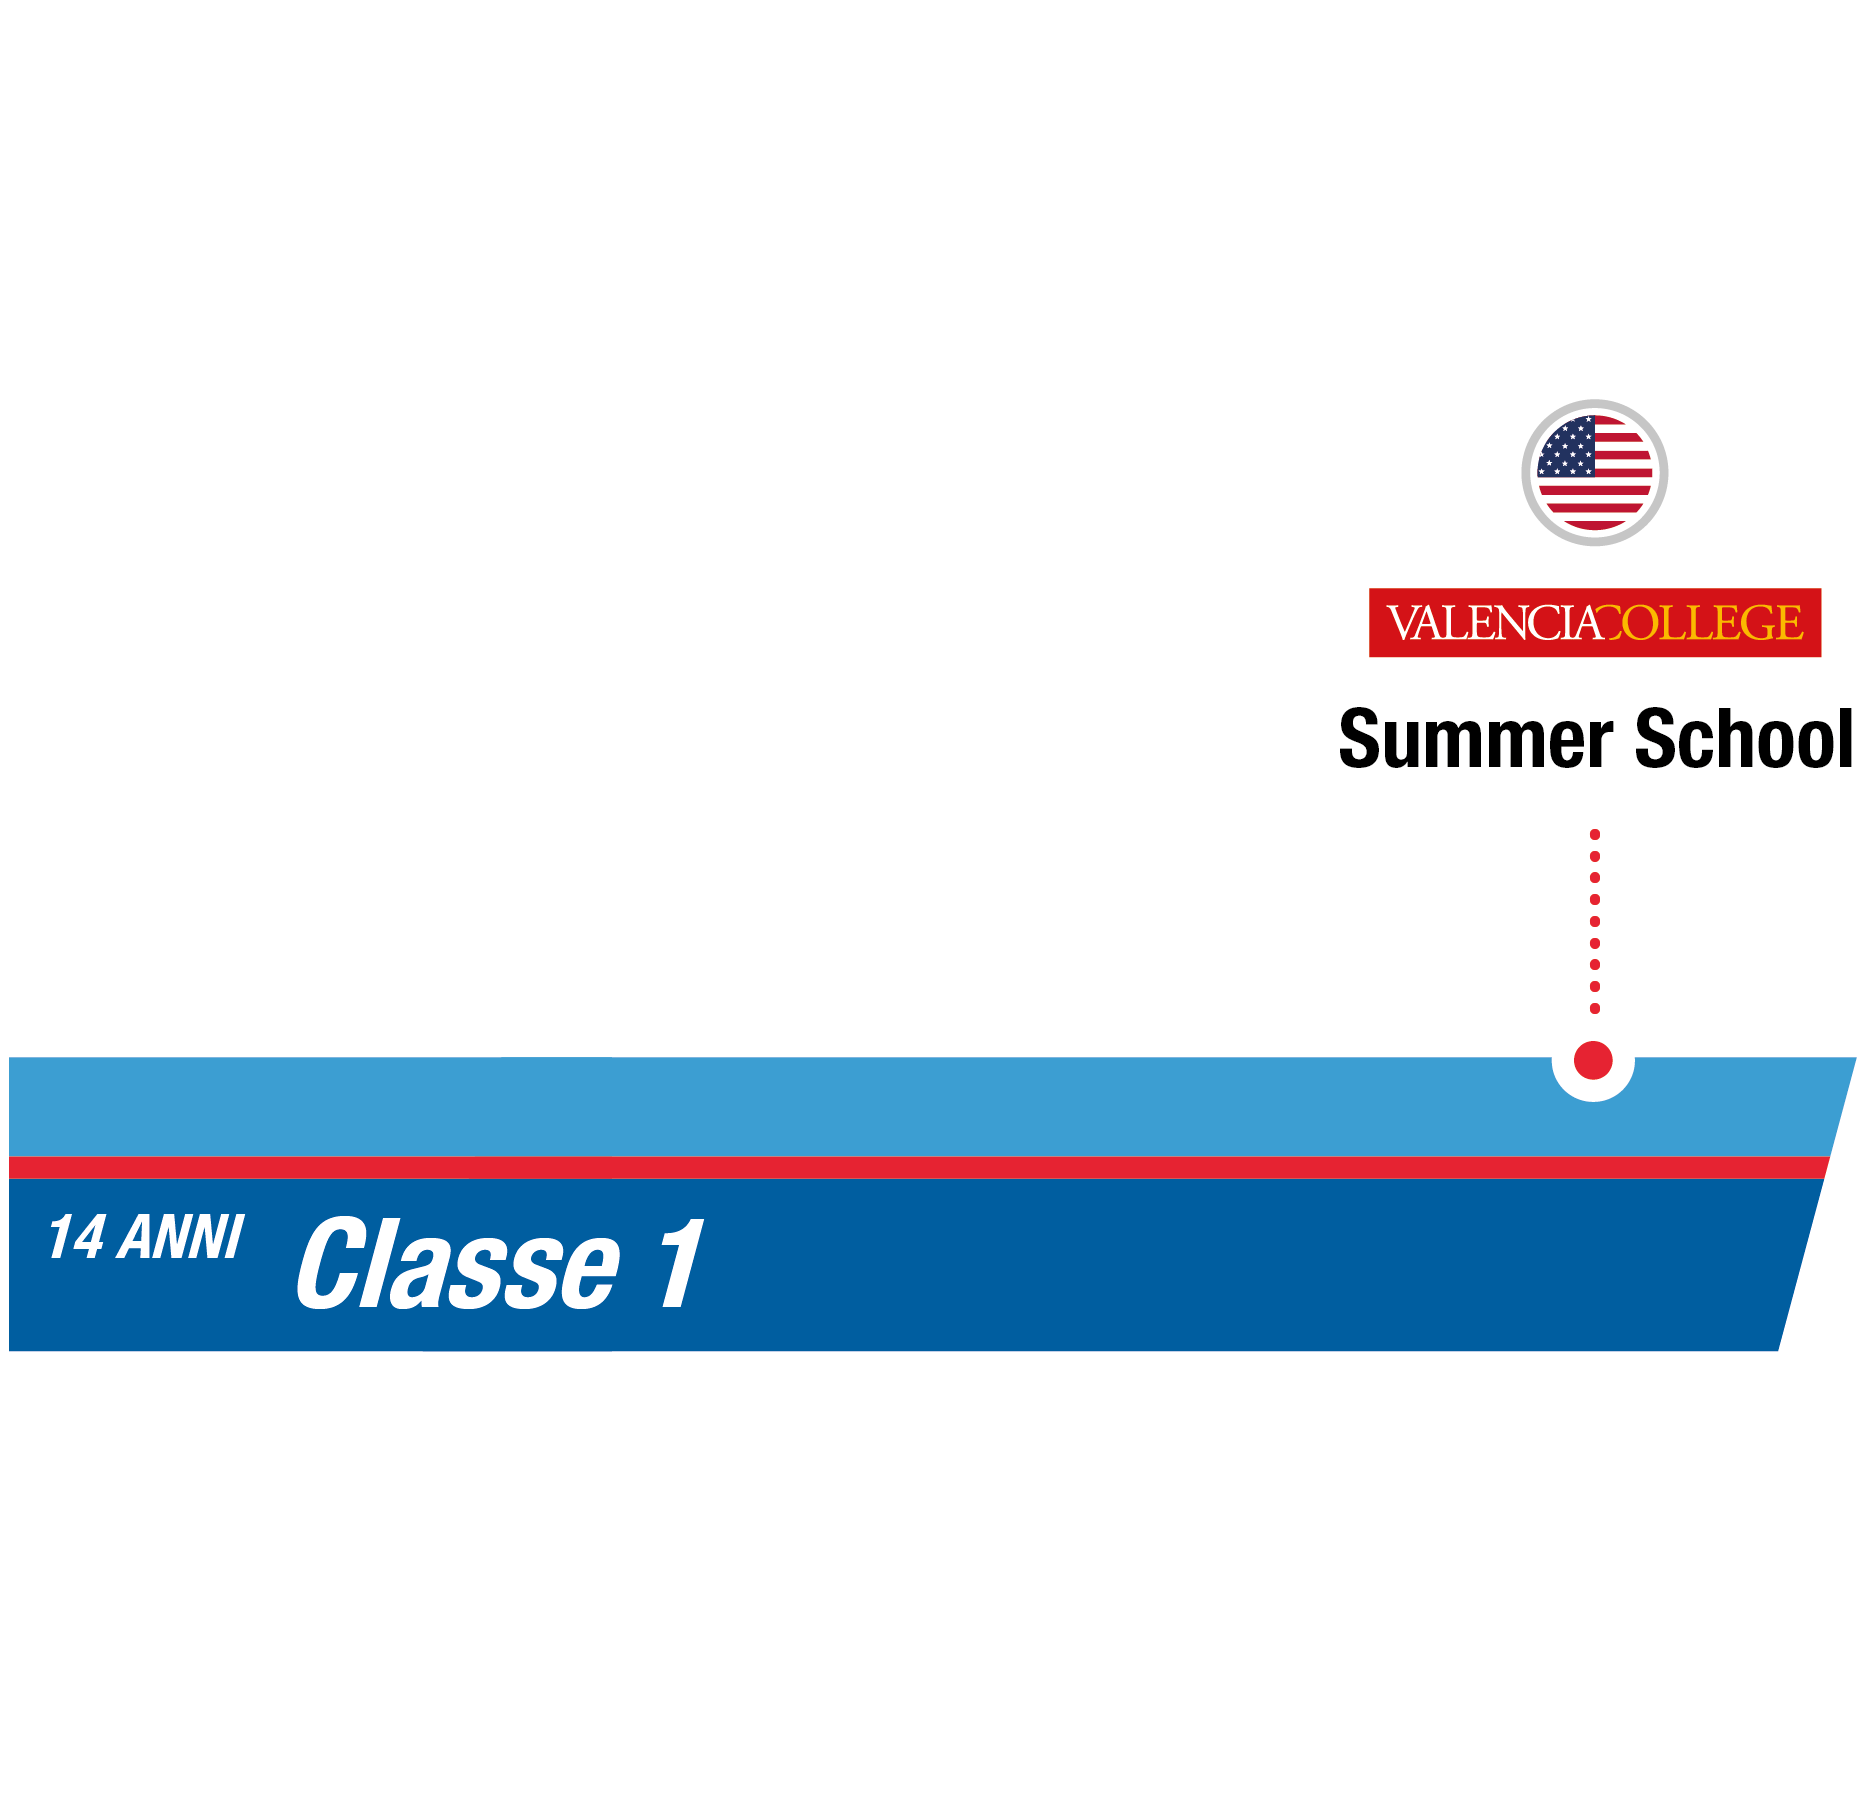 istituto-nobile-aviation-college-summerschool-1anno